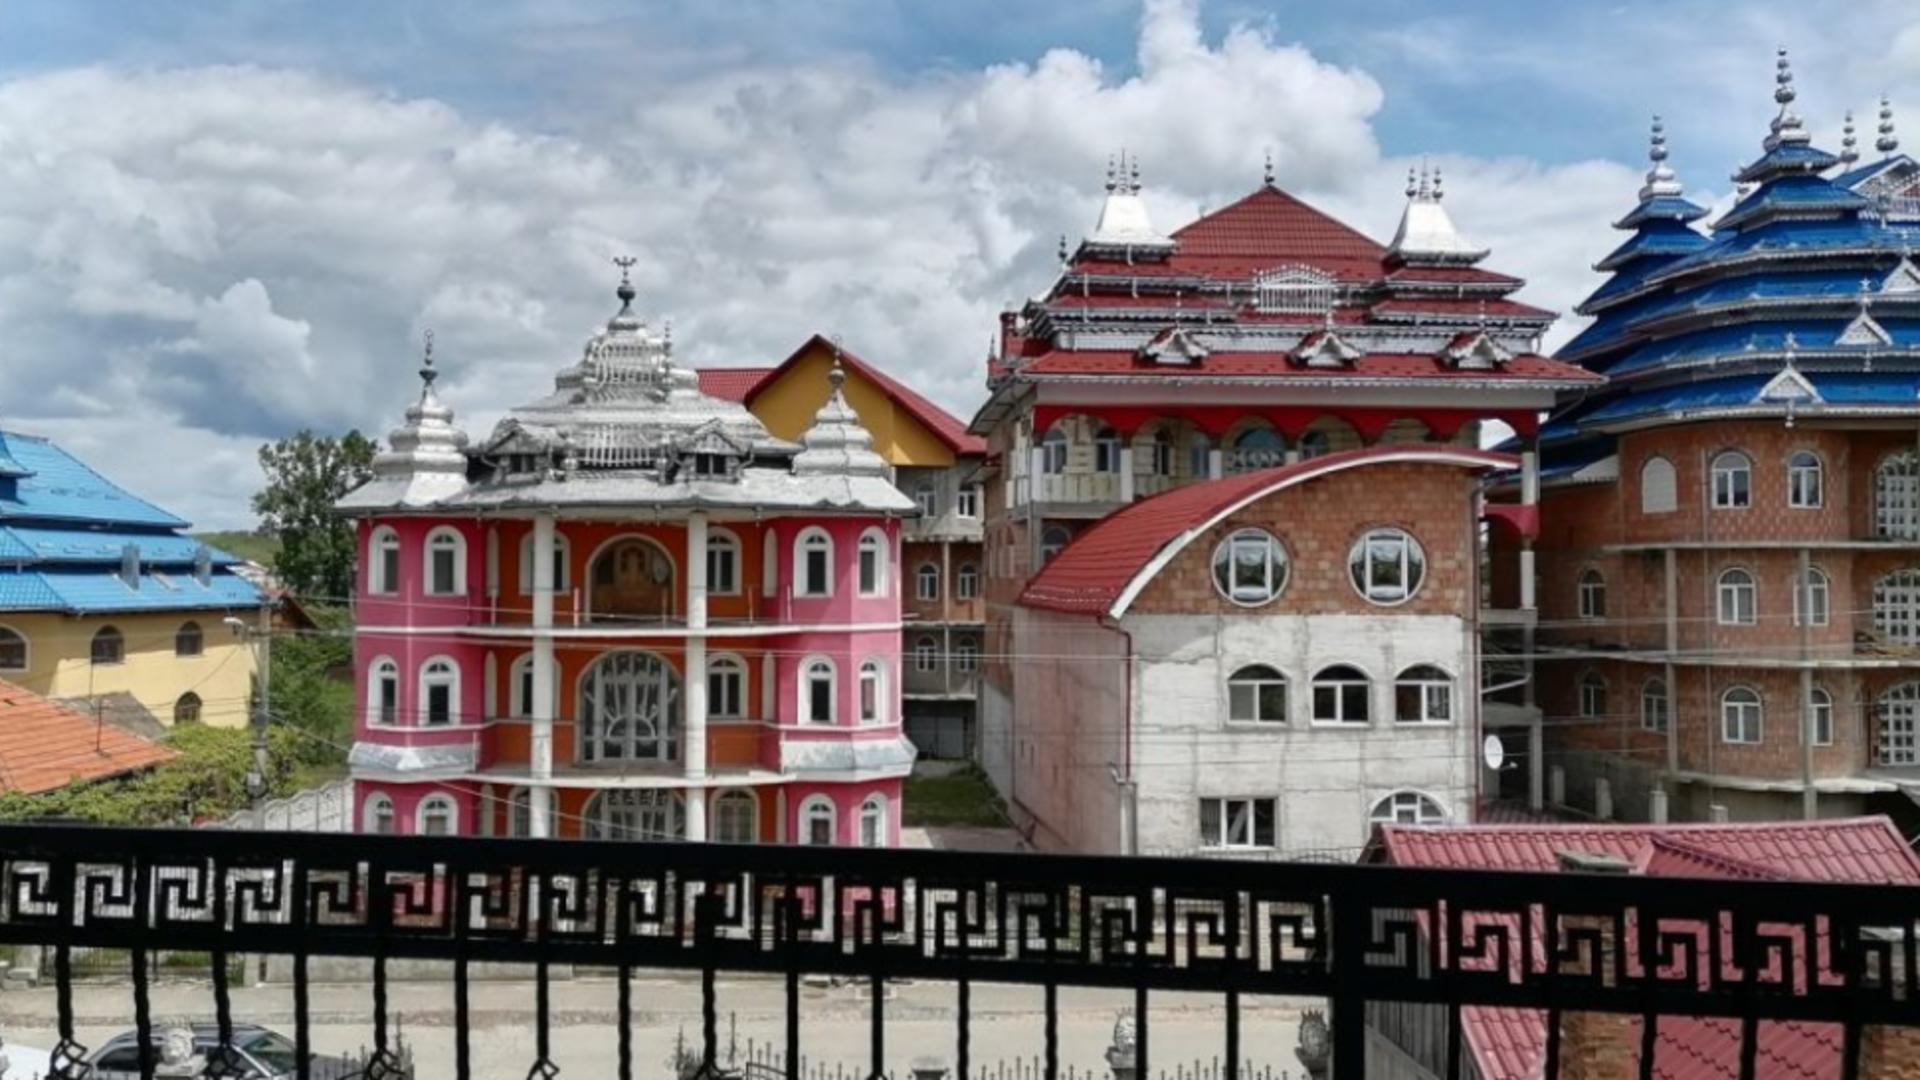 Palat din comunitatea romă Huedin (foto FB/Adrian Dohotaru)